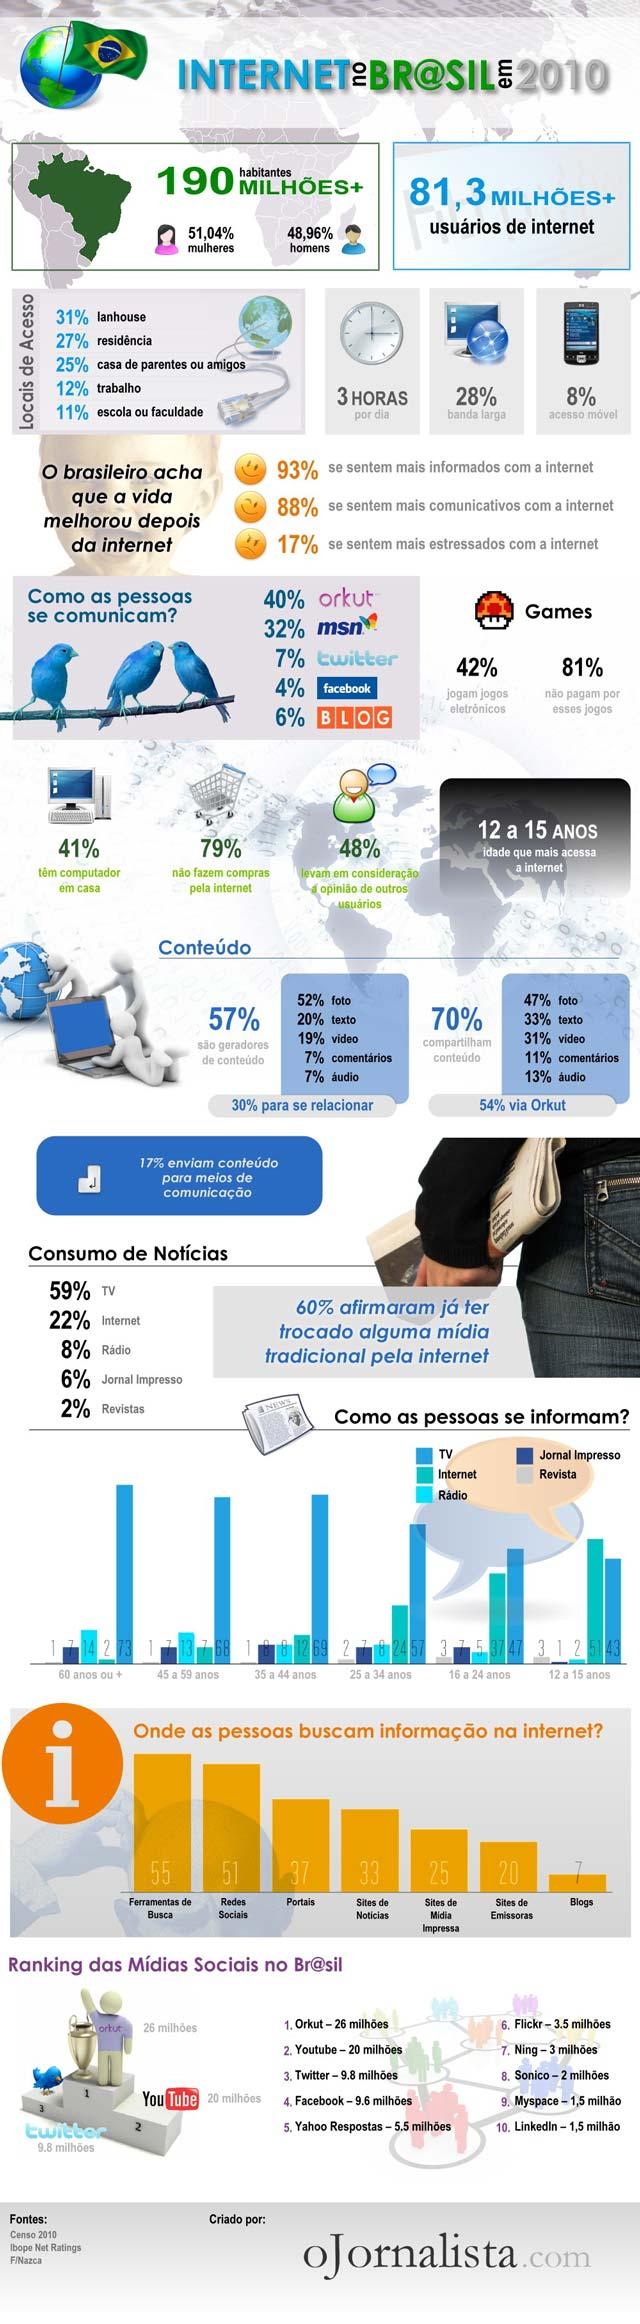 Infográfico sobre Internet no Brasil. Como é o internauta brasileiro?